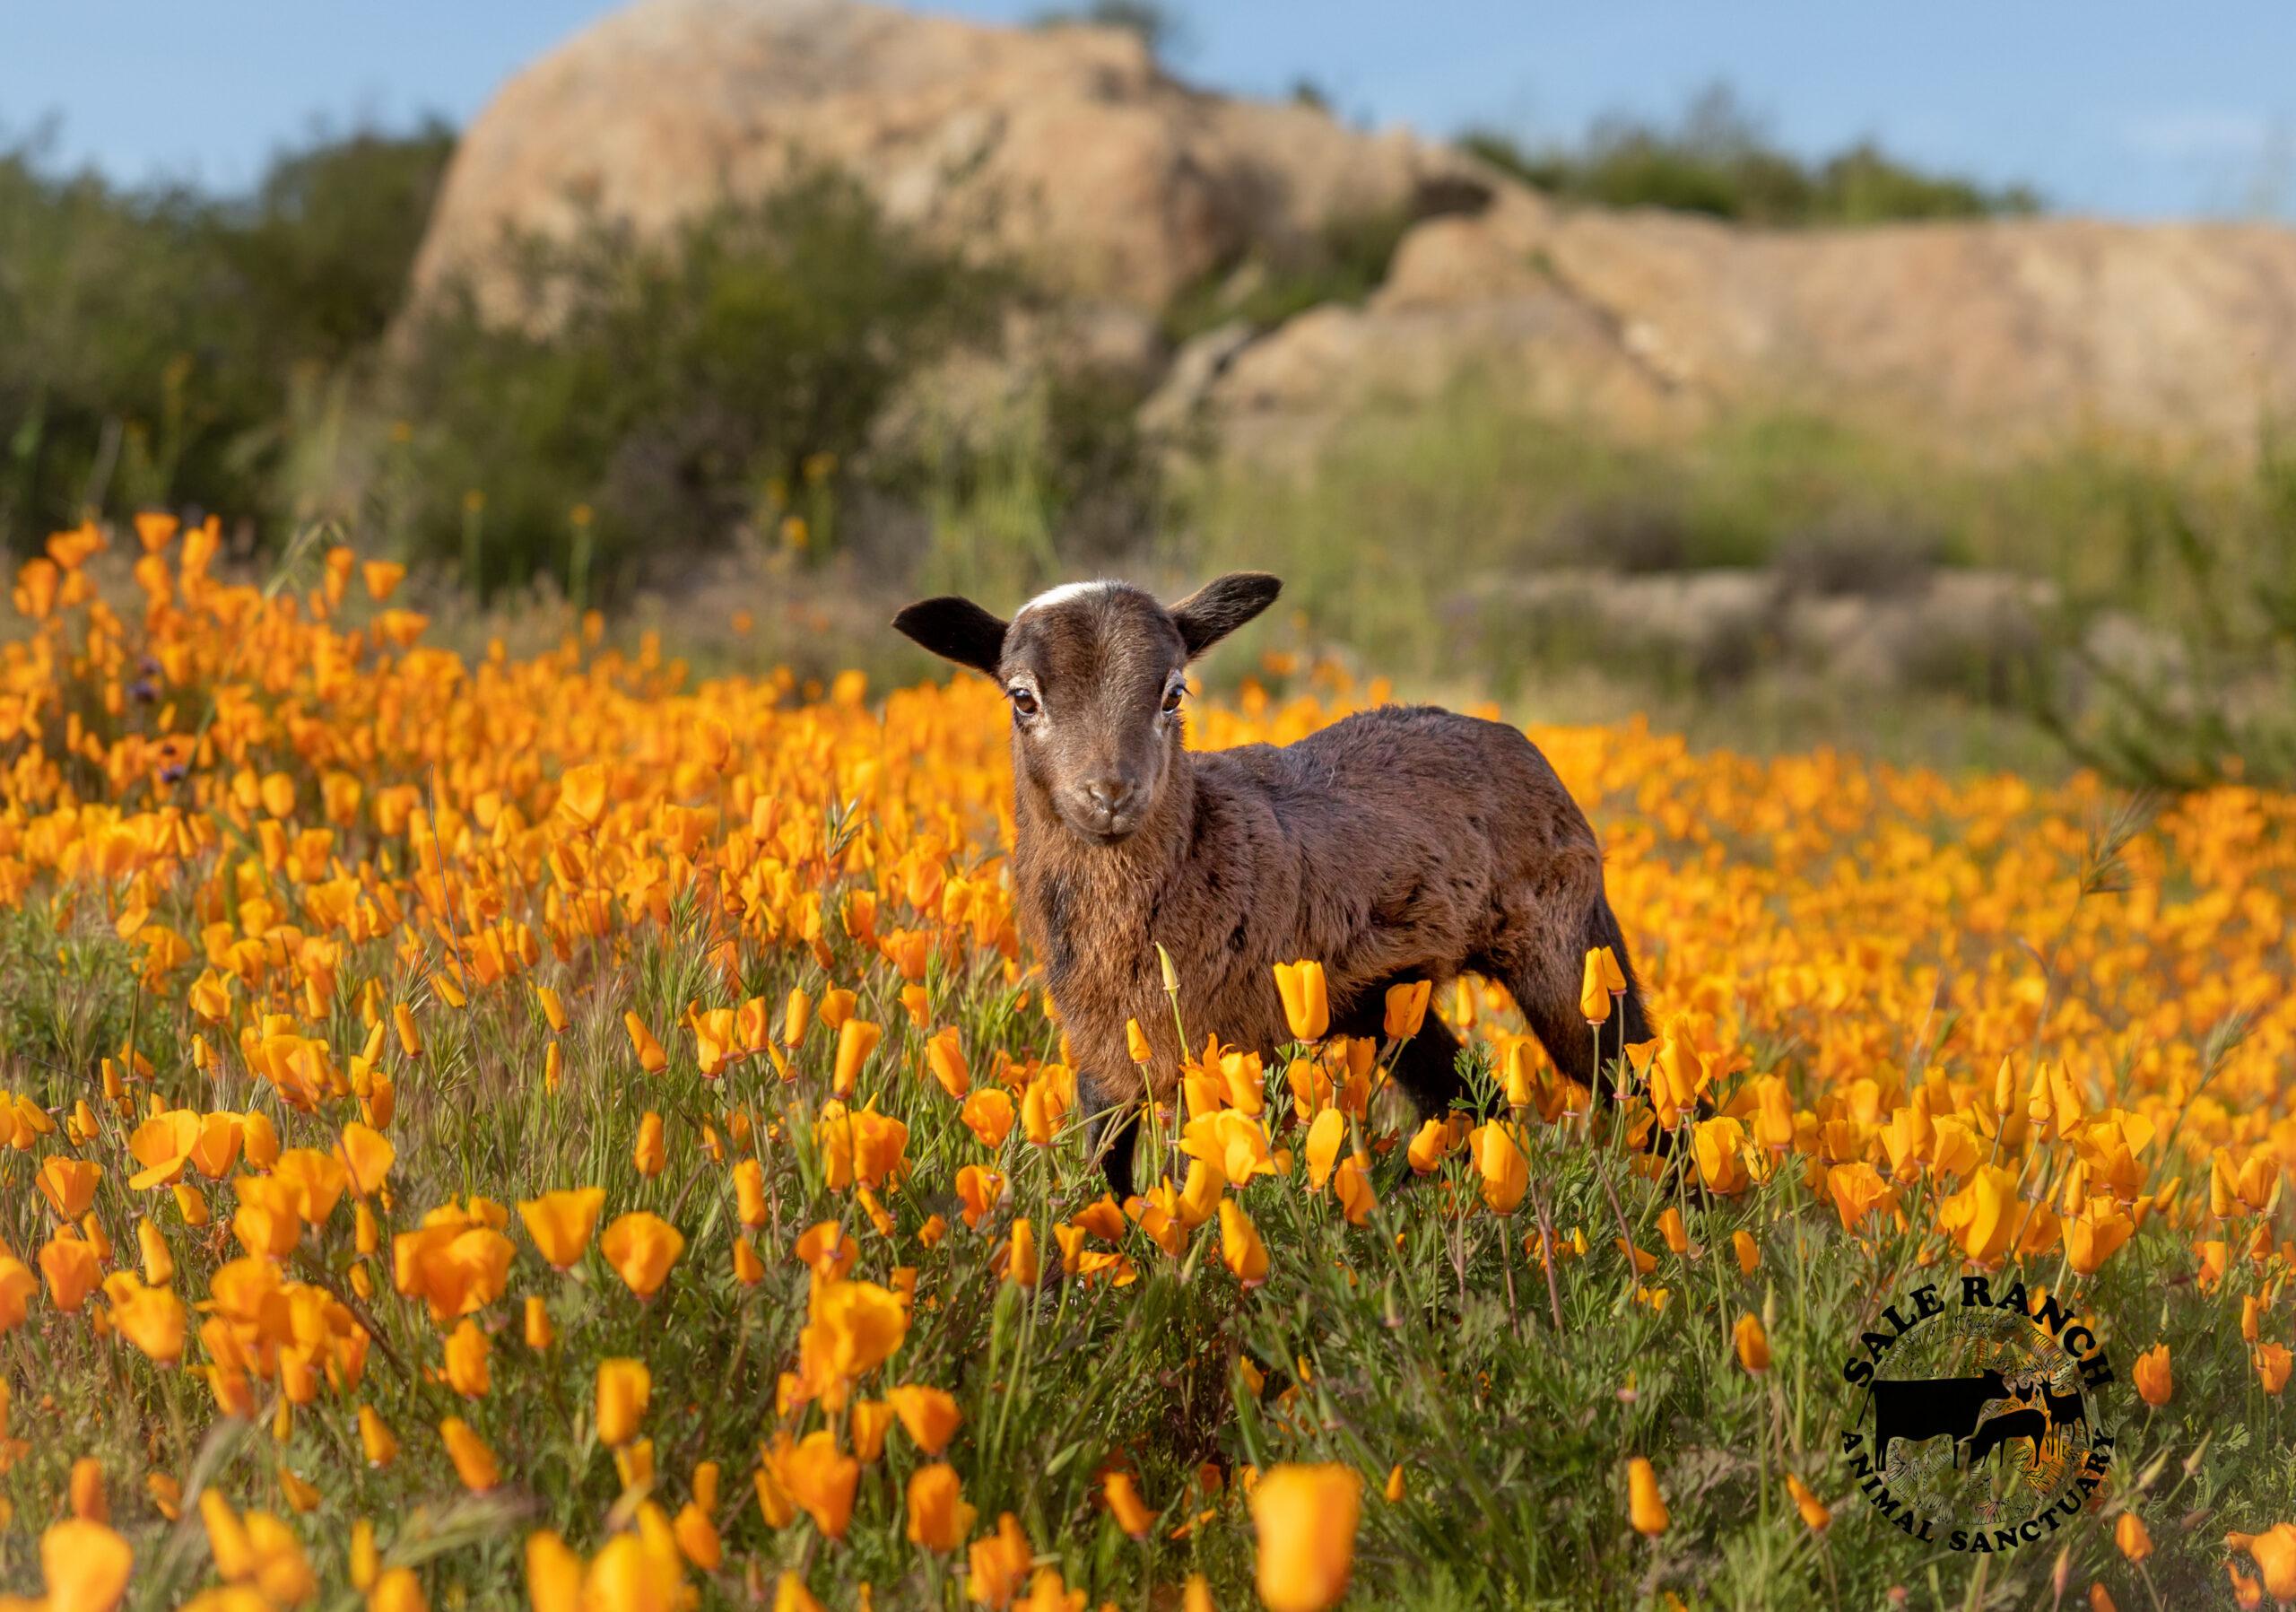 Hazel the Goat